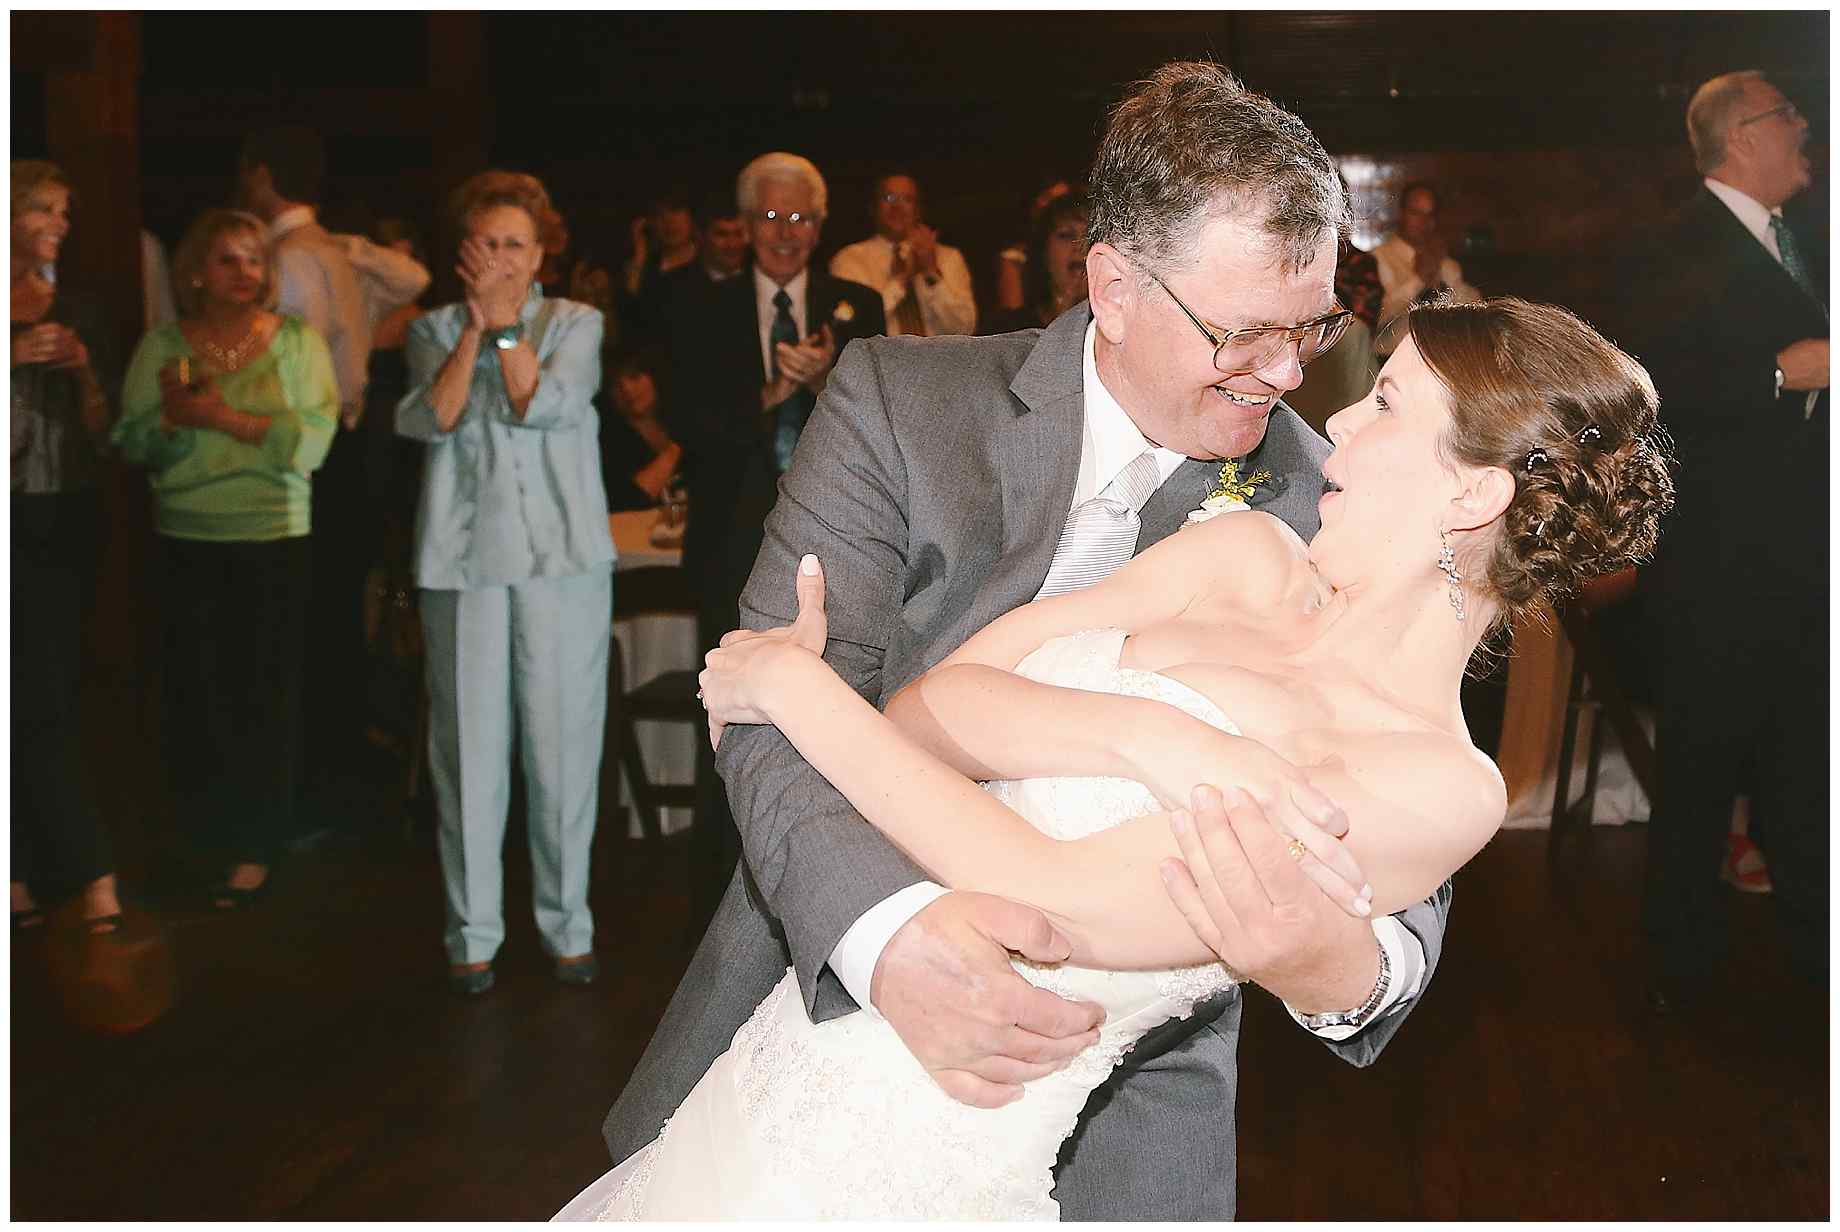 top-father-daughter-wedding-dance-04B